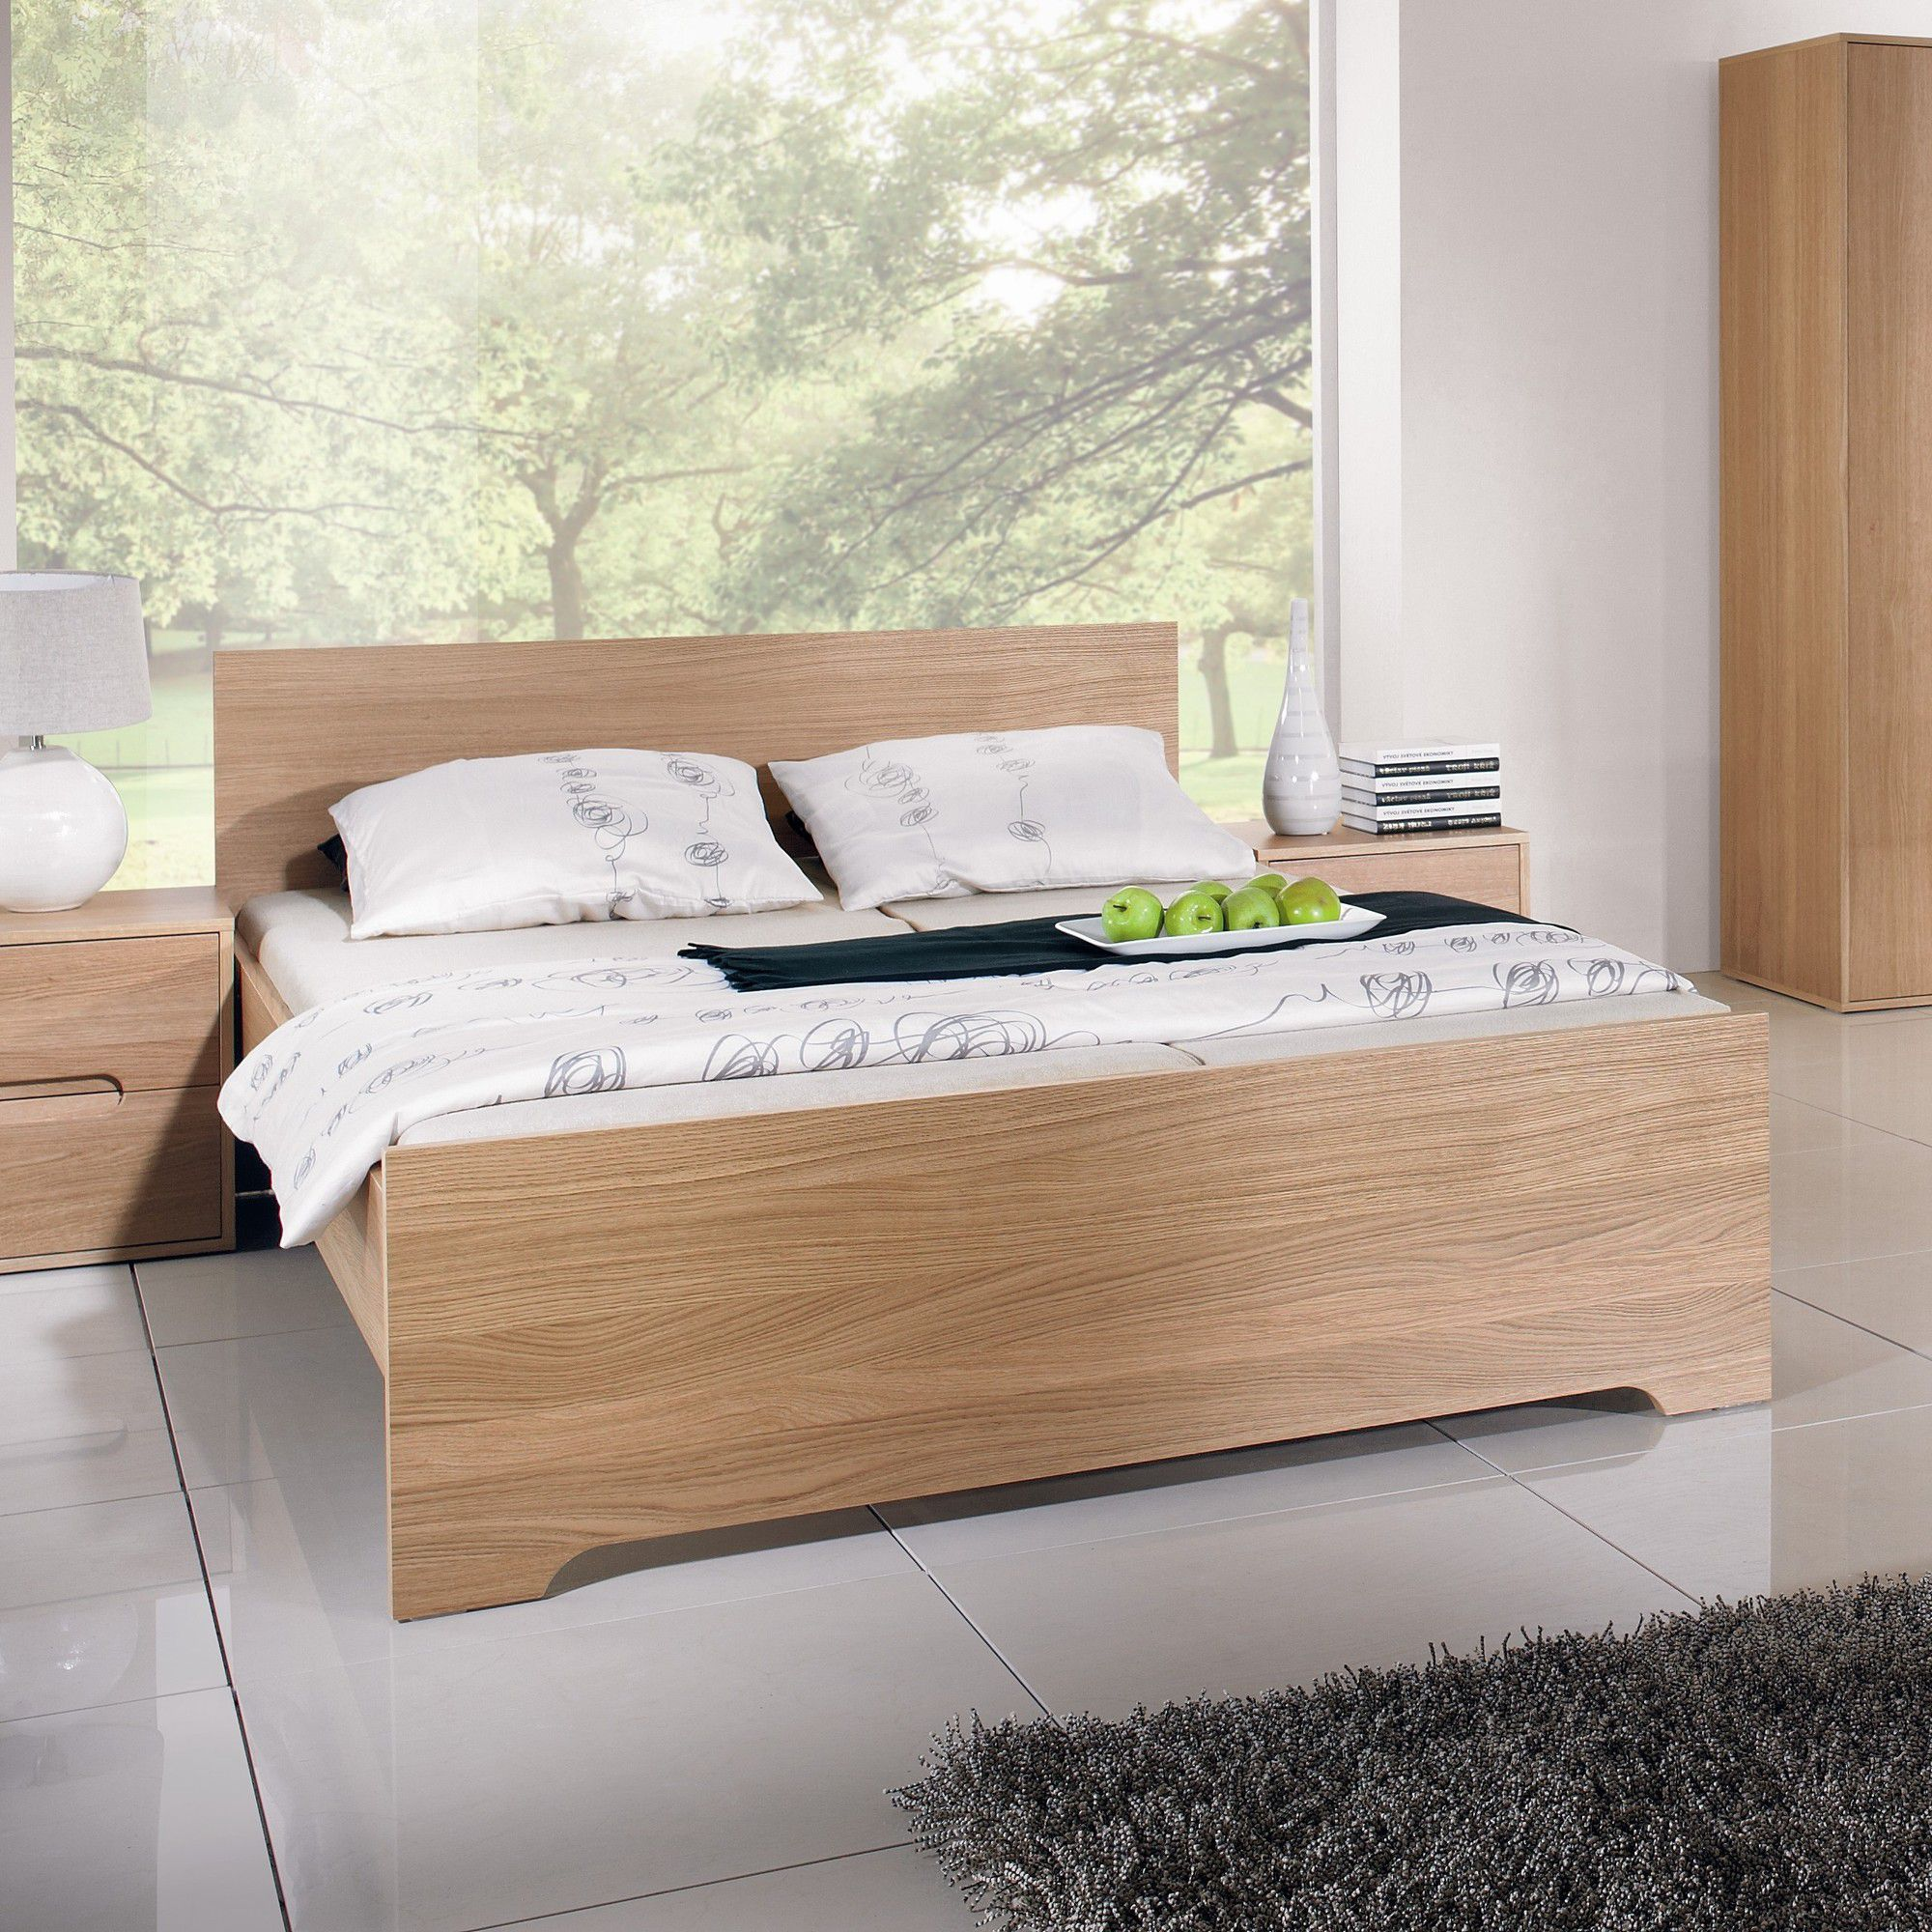 Urbane Designs Bolero Double Bedstead at Tesco Direct